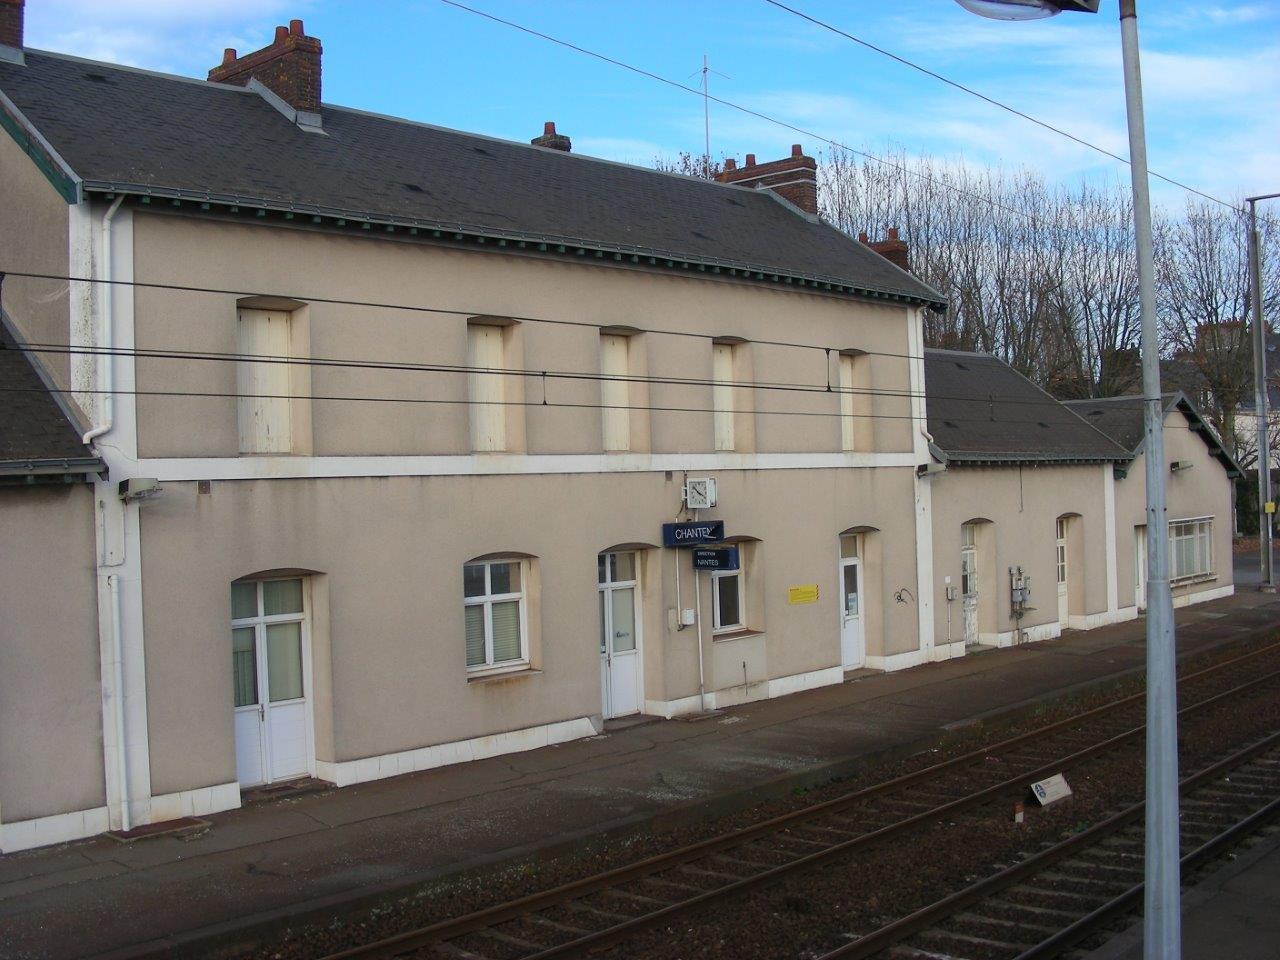 gare-de-chantenay-train-station